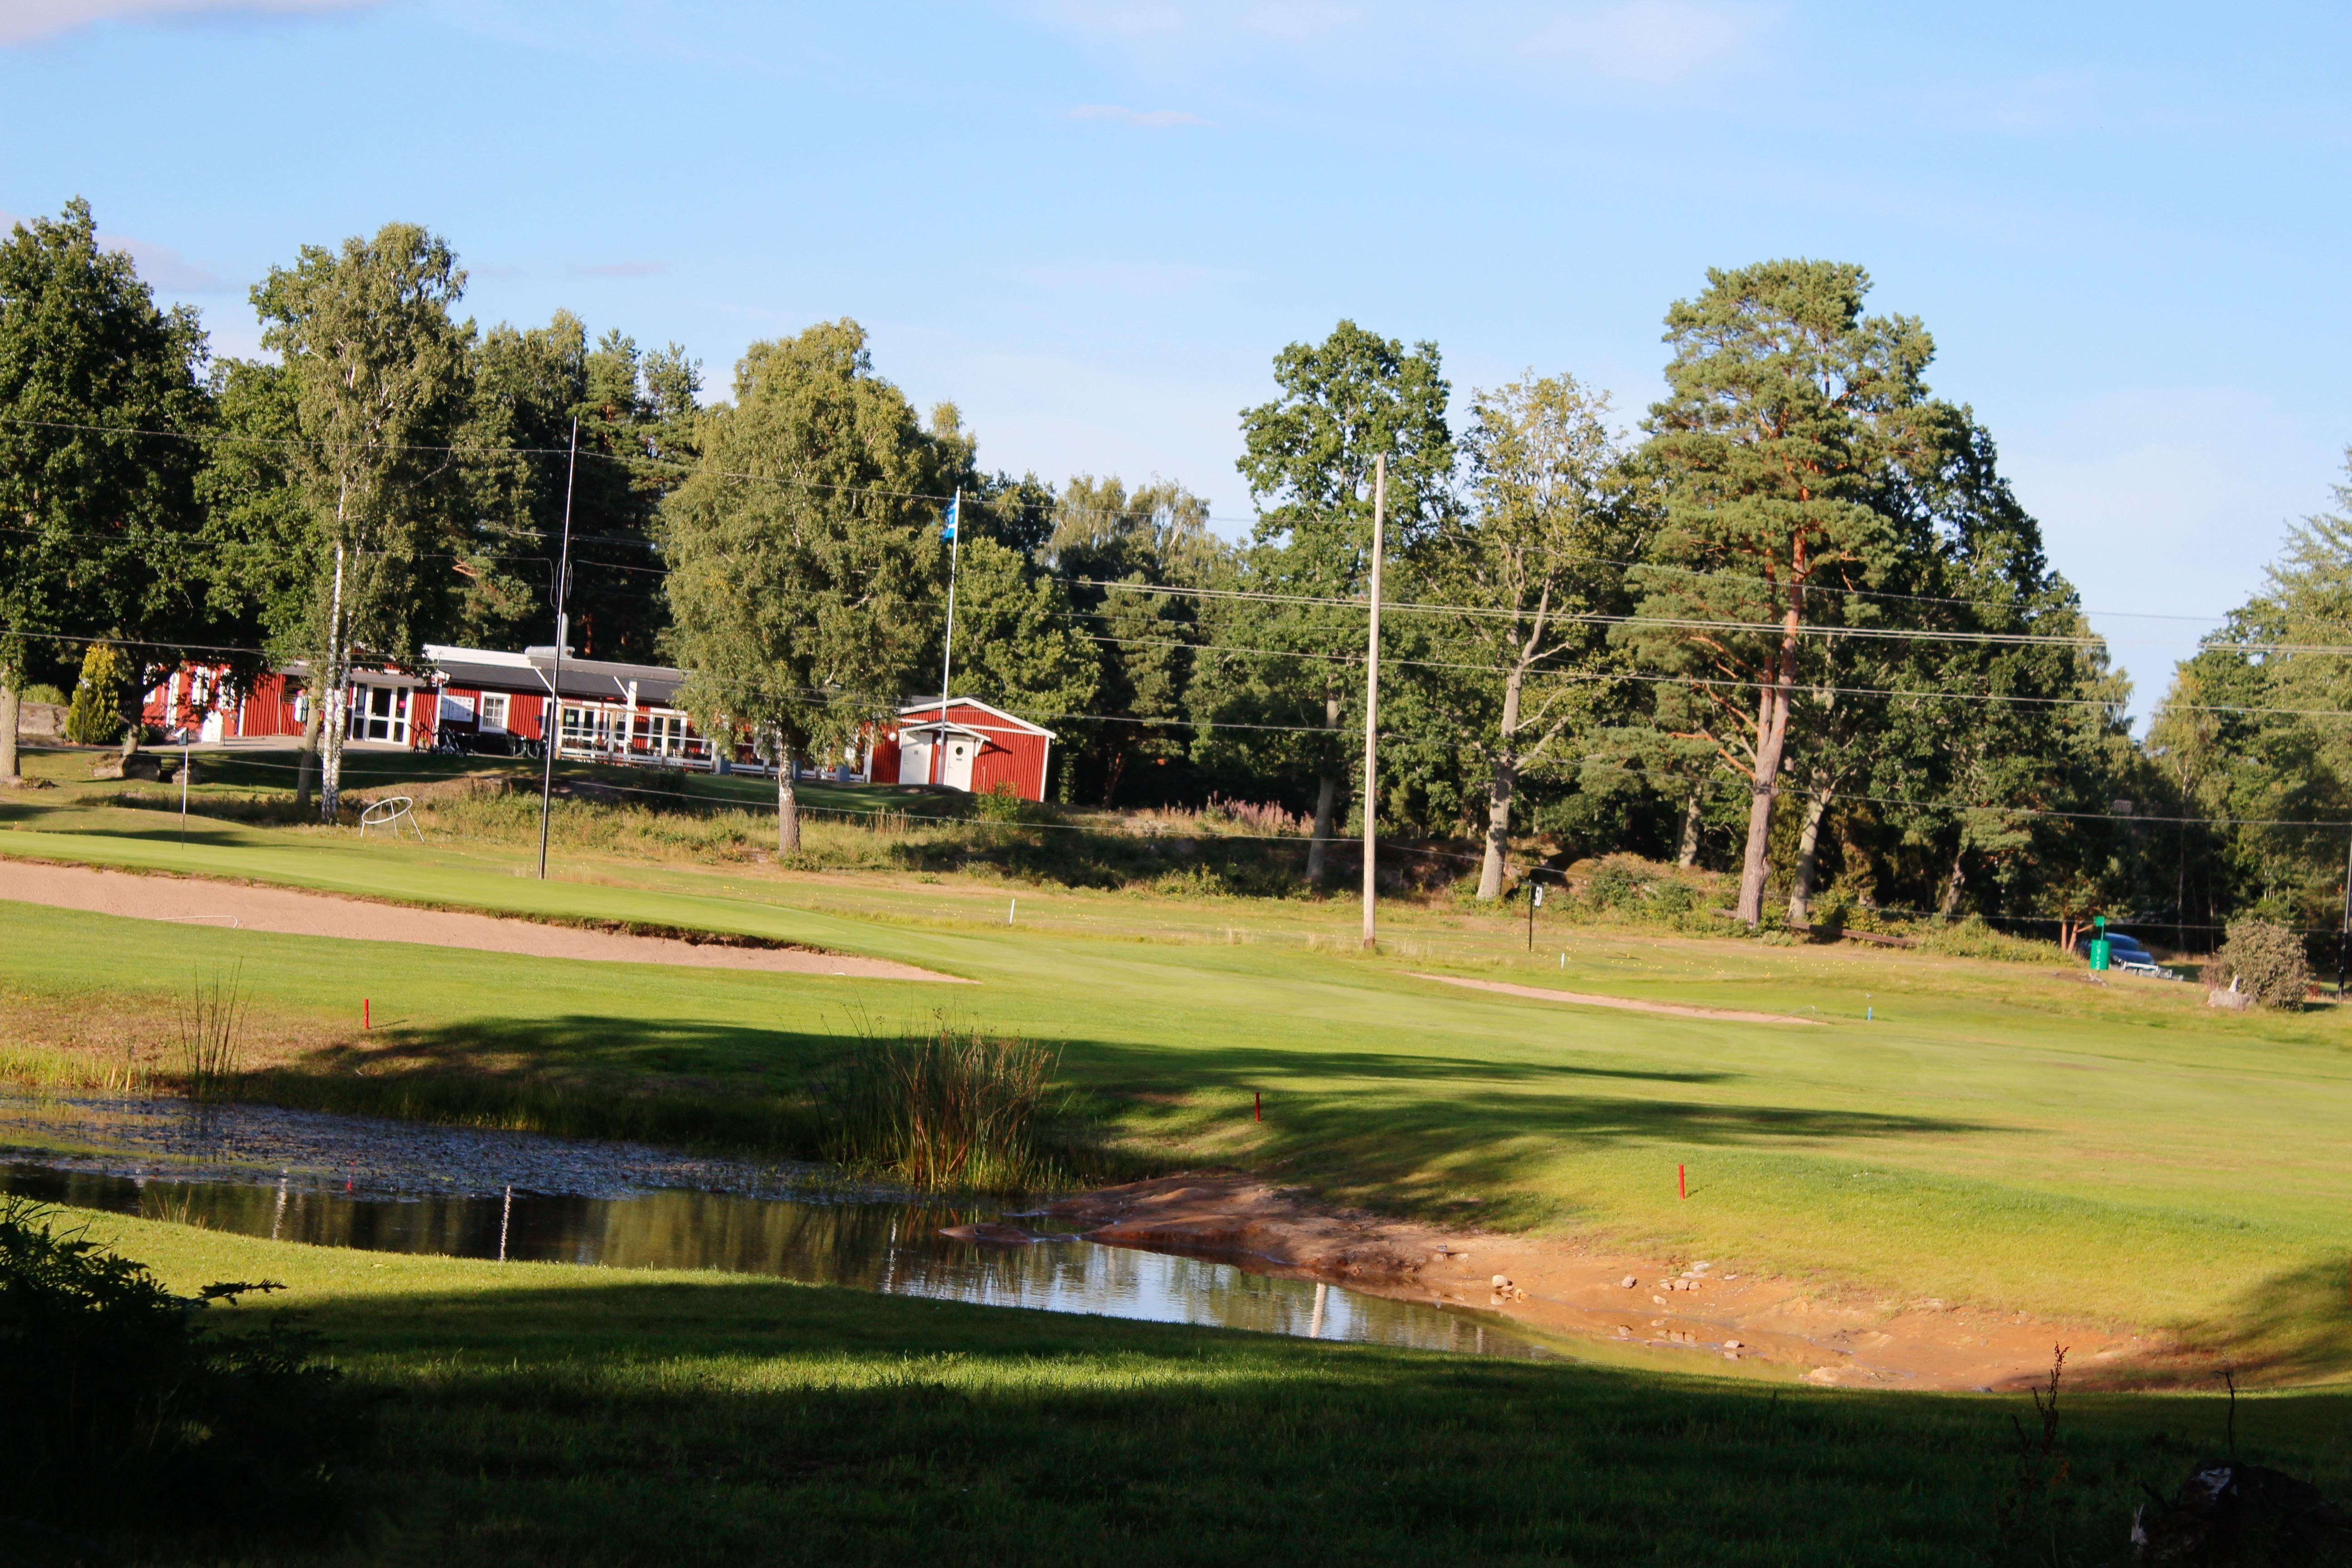 Oskarshamns Golf Club